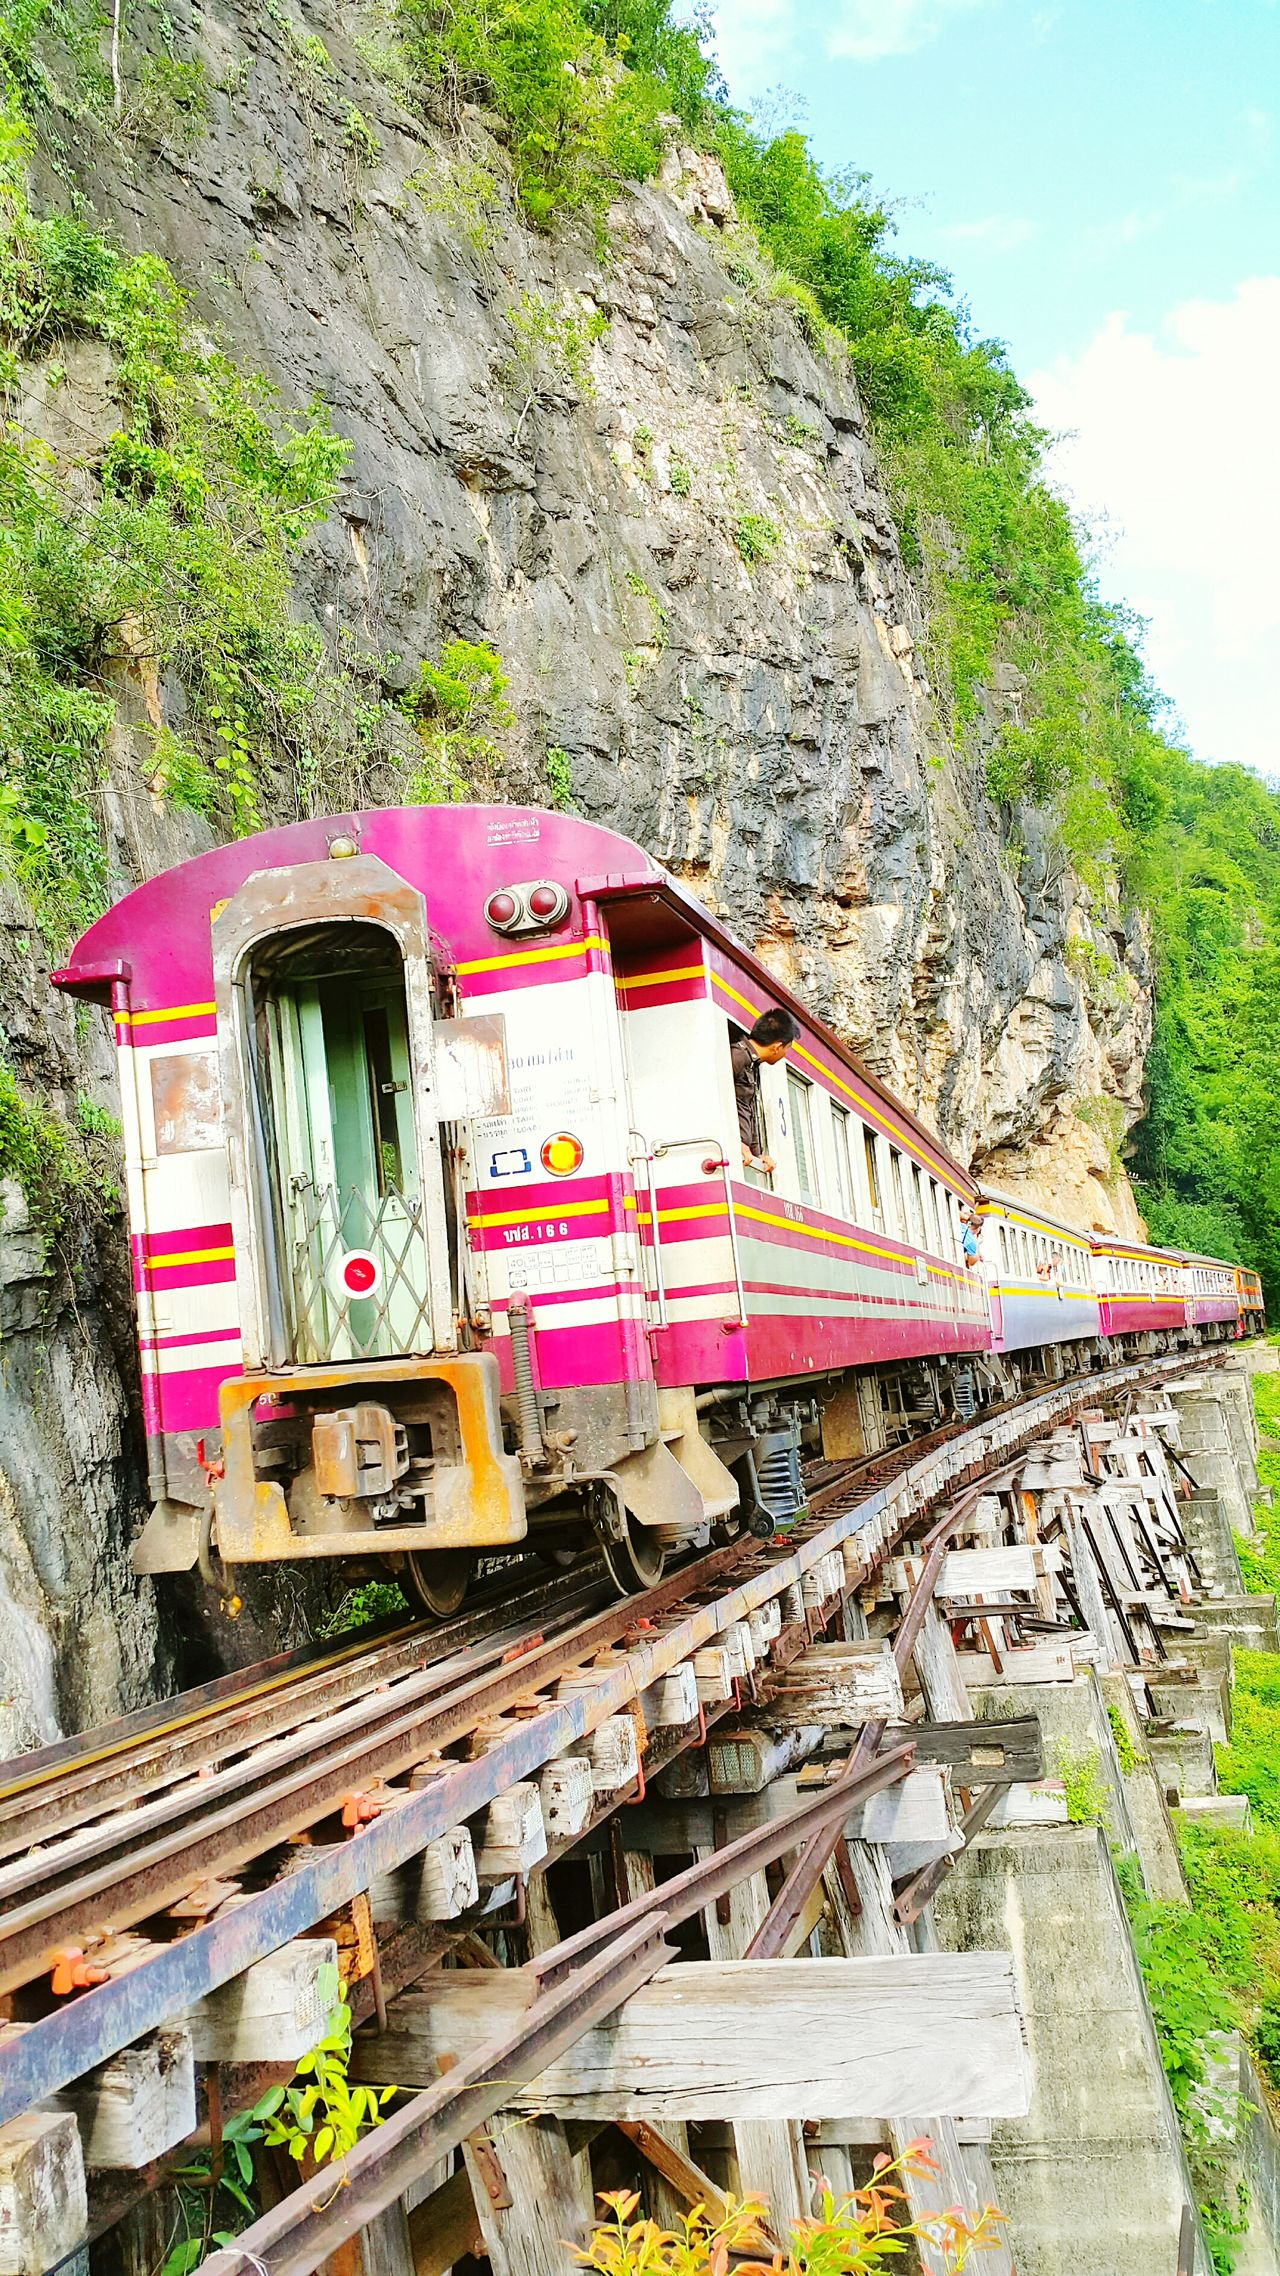 Death Railway Train Trainphotography Train_of_our_world Train Rail Training Day Training Time Kwai Noi The River Kanchanaburi Railroadphotography